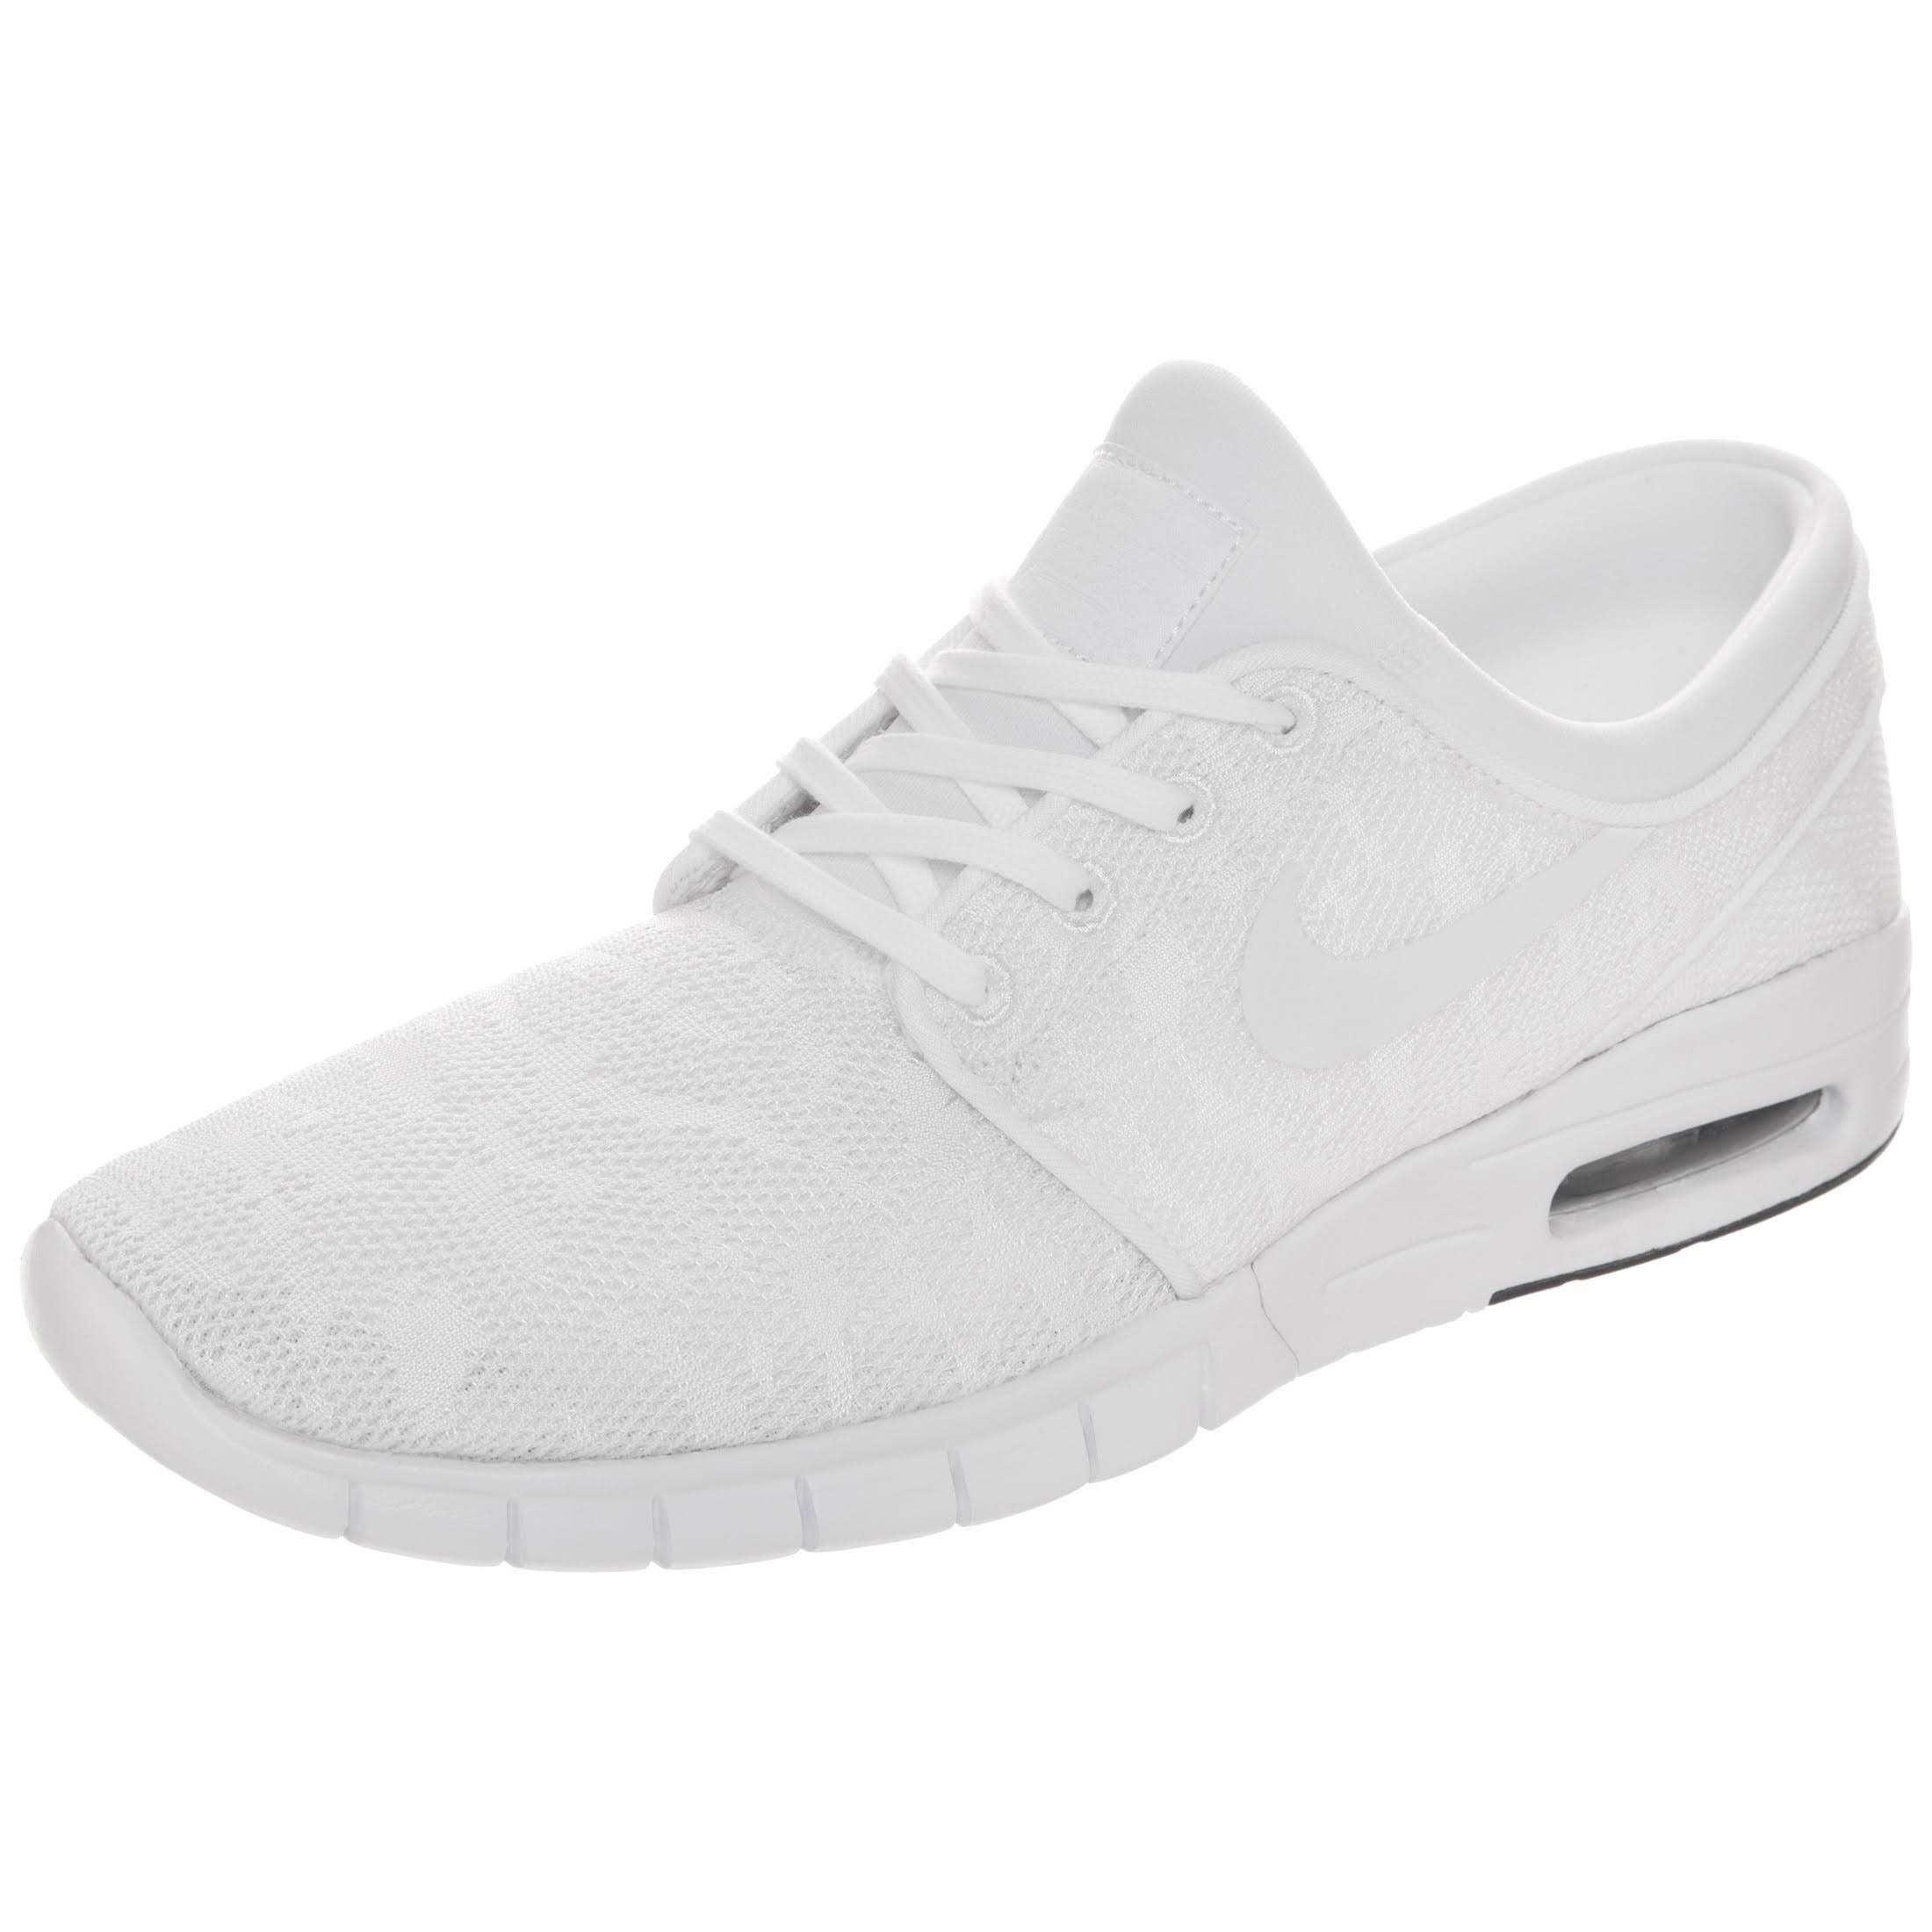 Max grau Weiß Weiß All Air Nike White Sneaker Sb Stefan Janoski UwIq7ZR4